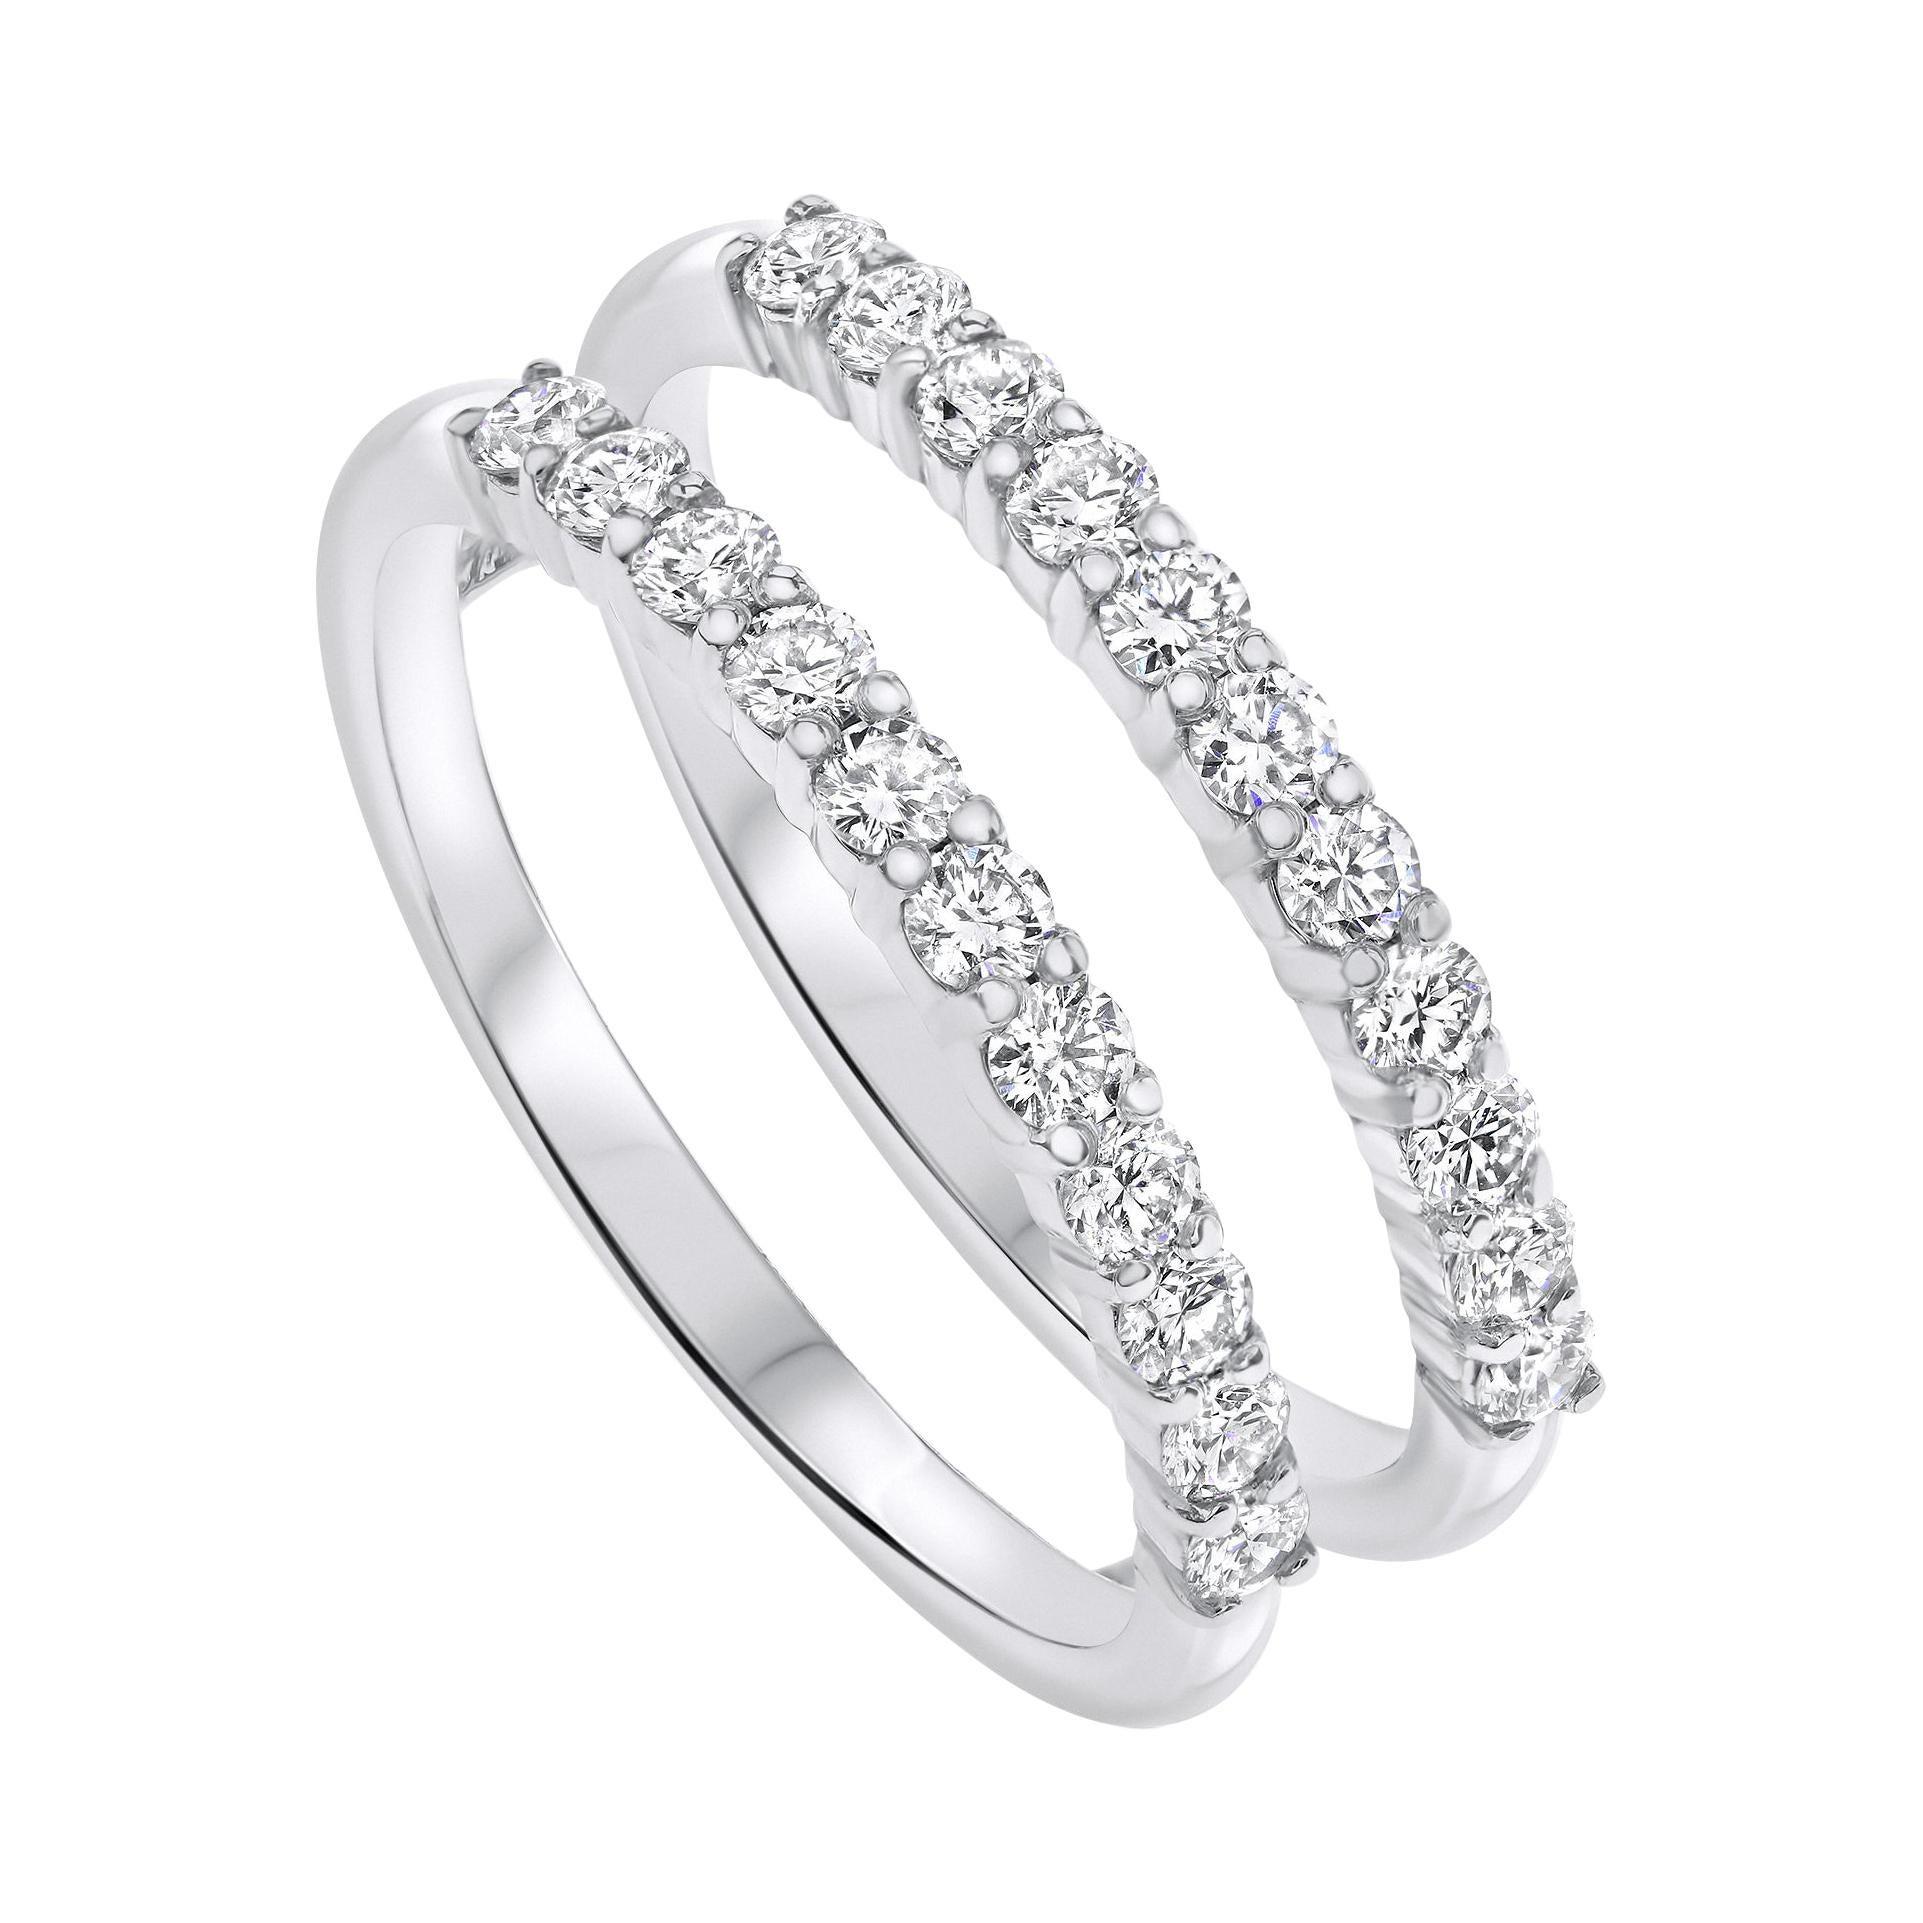 0.60 Carat Diamond Double Band Wedding Ring in 14k White Gold Shlomit Rogel